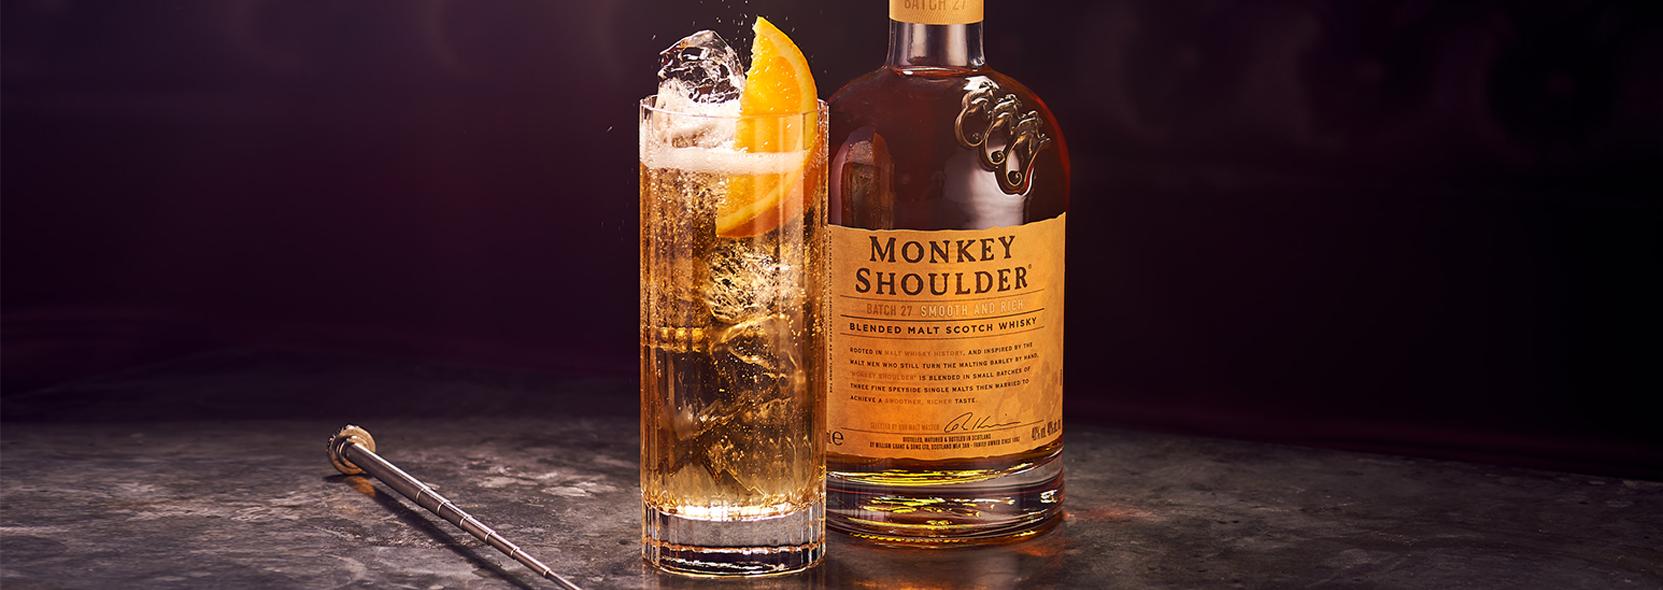 Monkey Shoulder Ginger Monkey